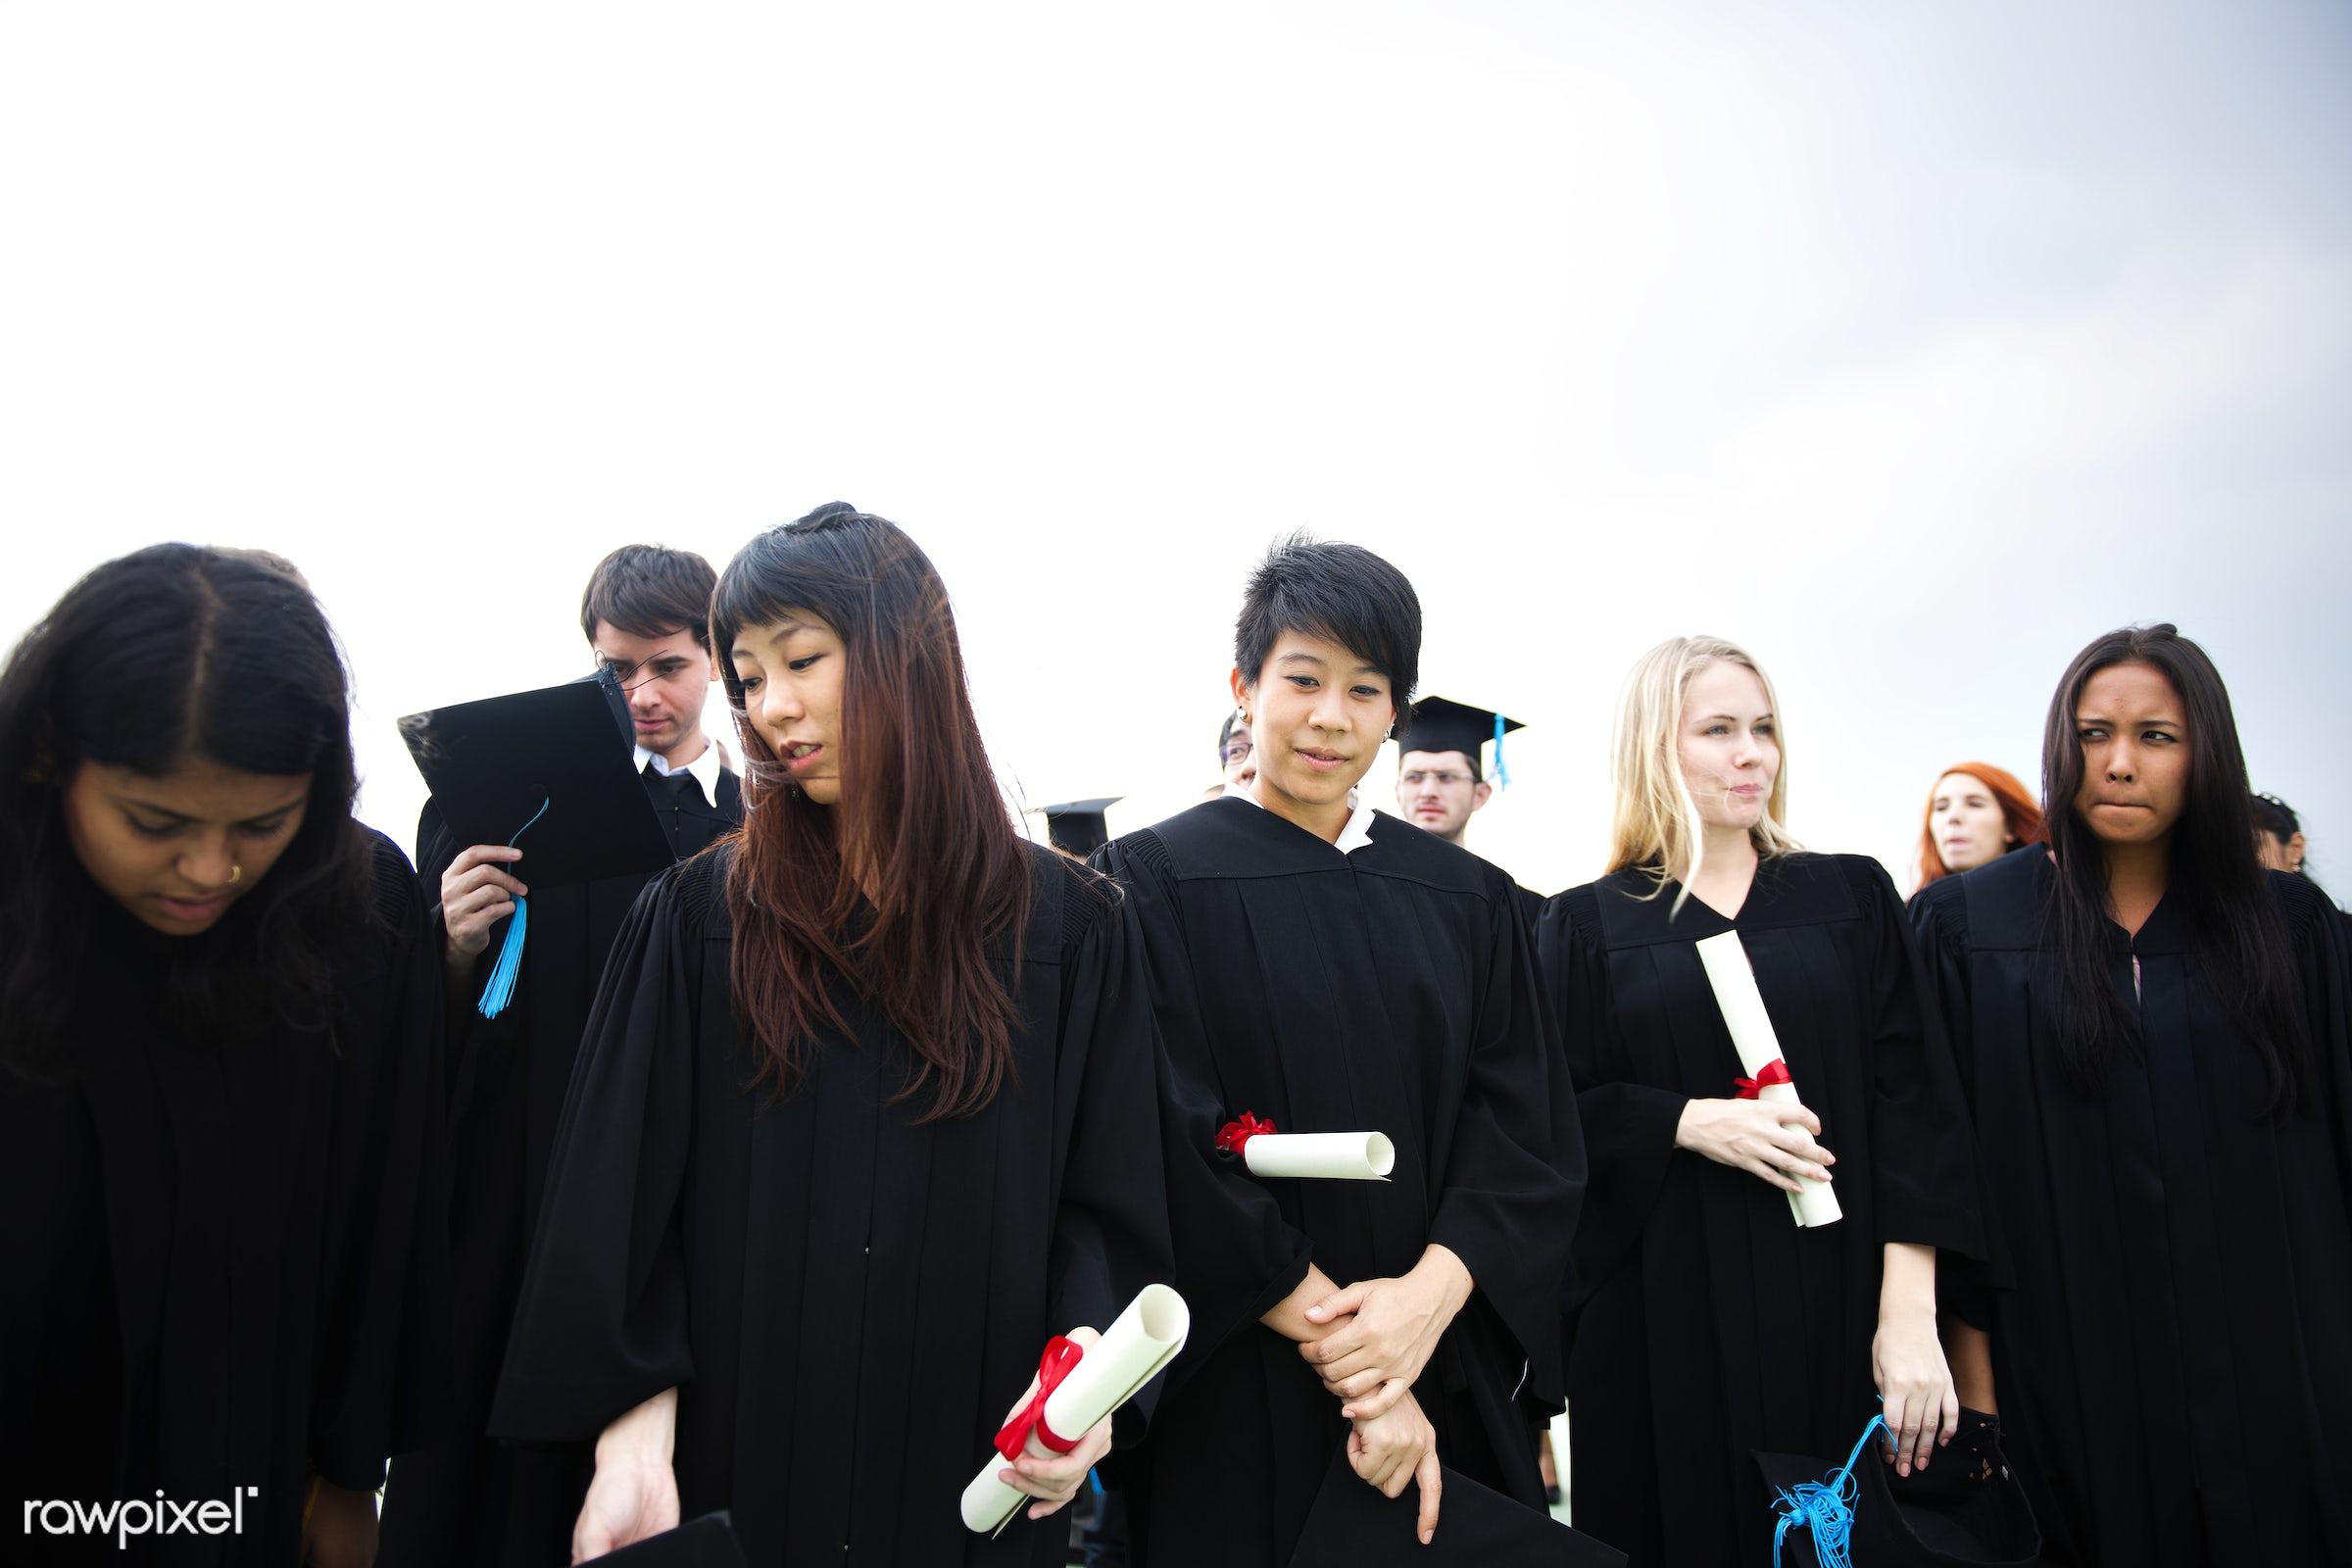 african descent, asian, black, caps, caucasian, ceremony, congratulations, diversity, expression, face, gowns, grads,...